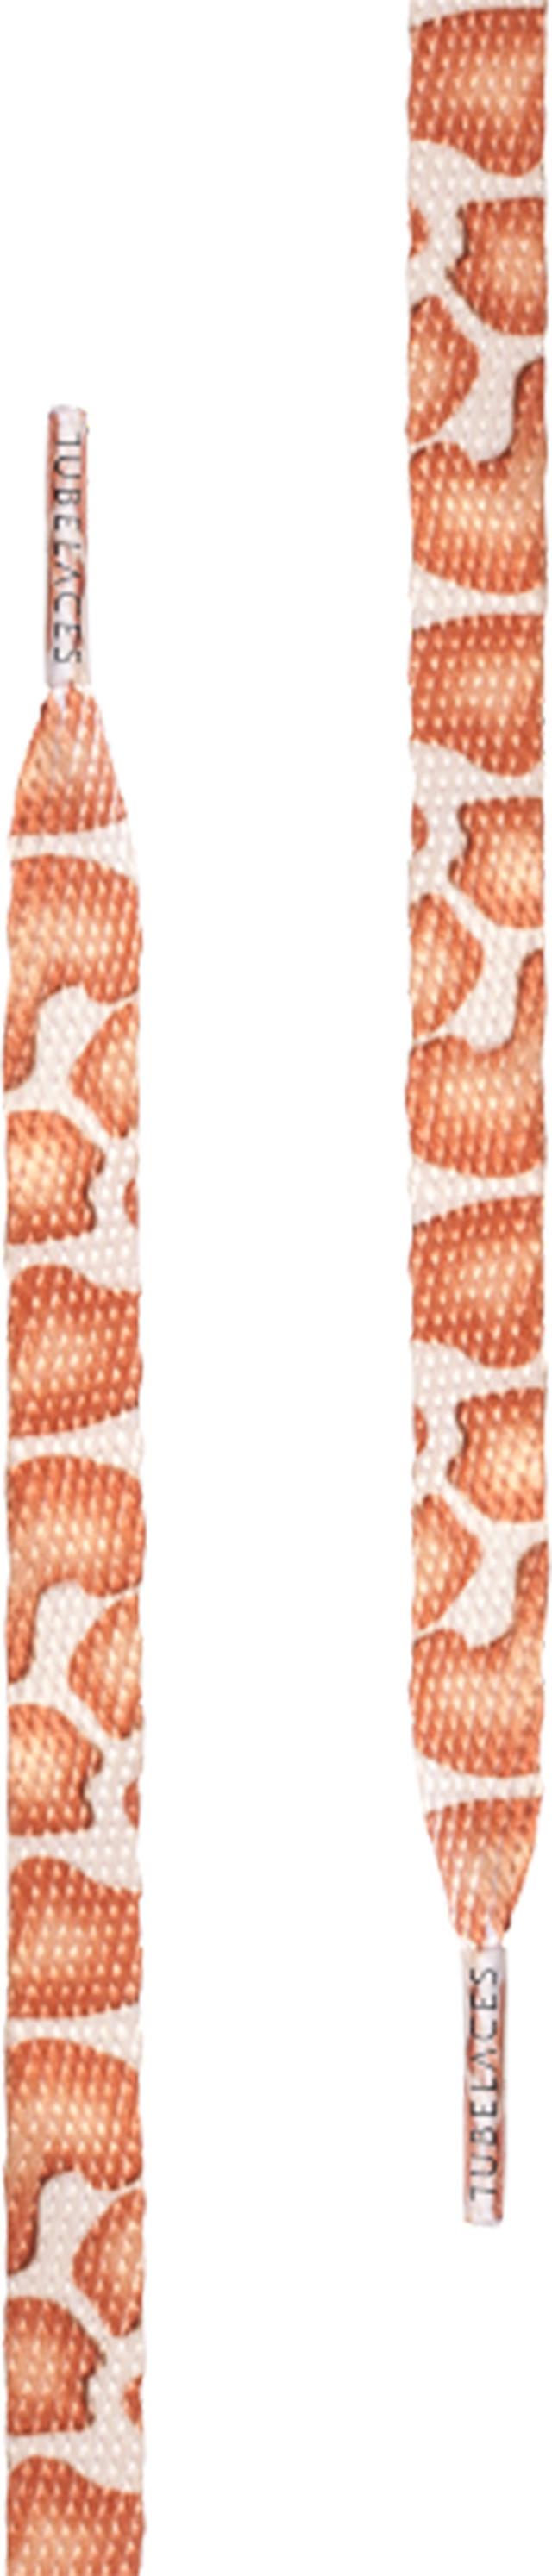 TubeLaces Special Flat Giraffe 120 cm 10462